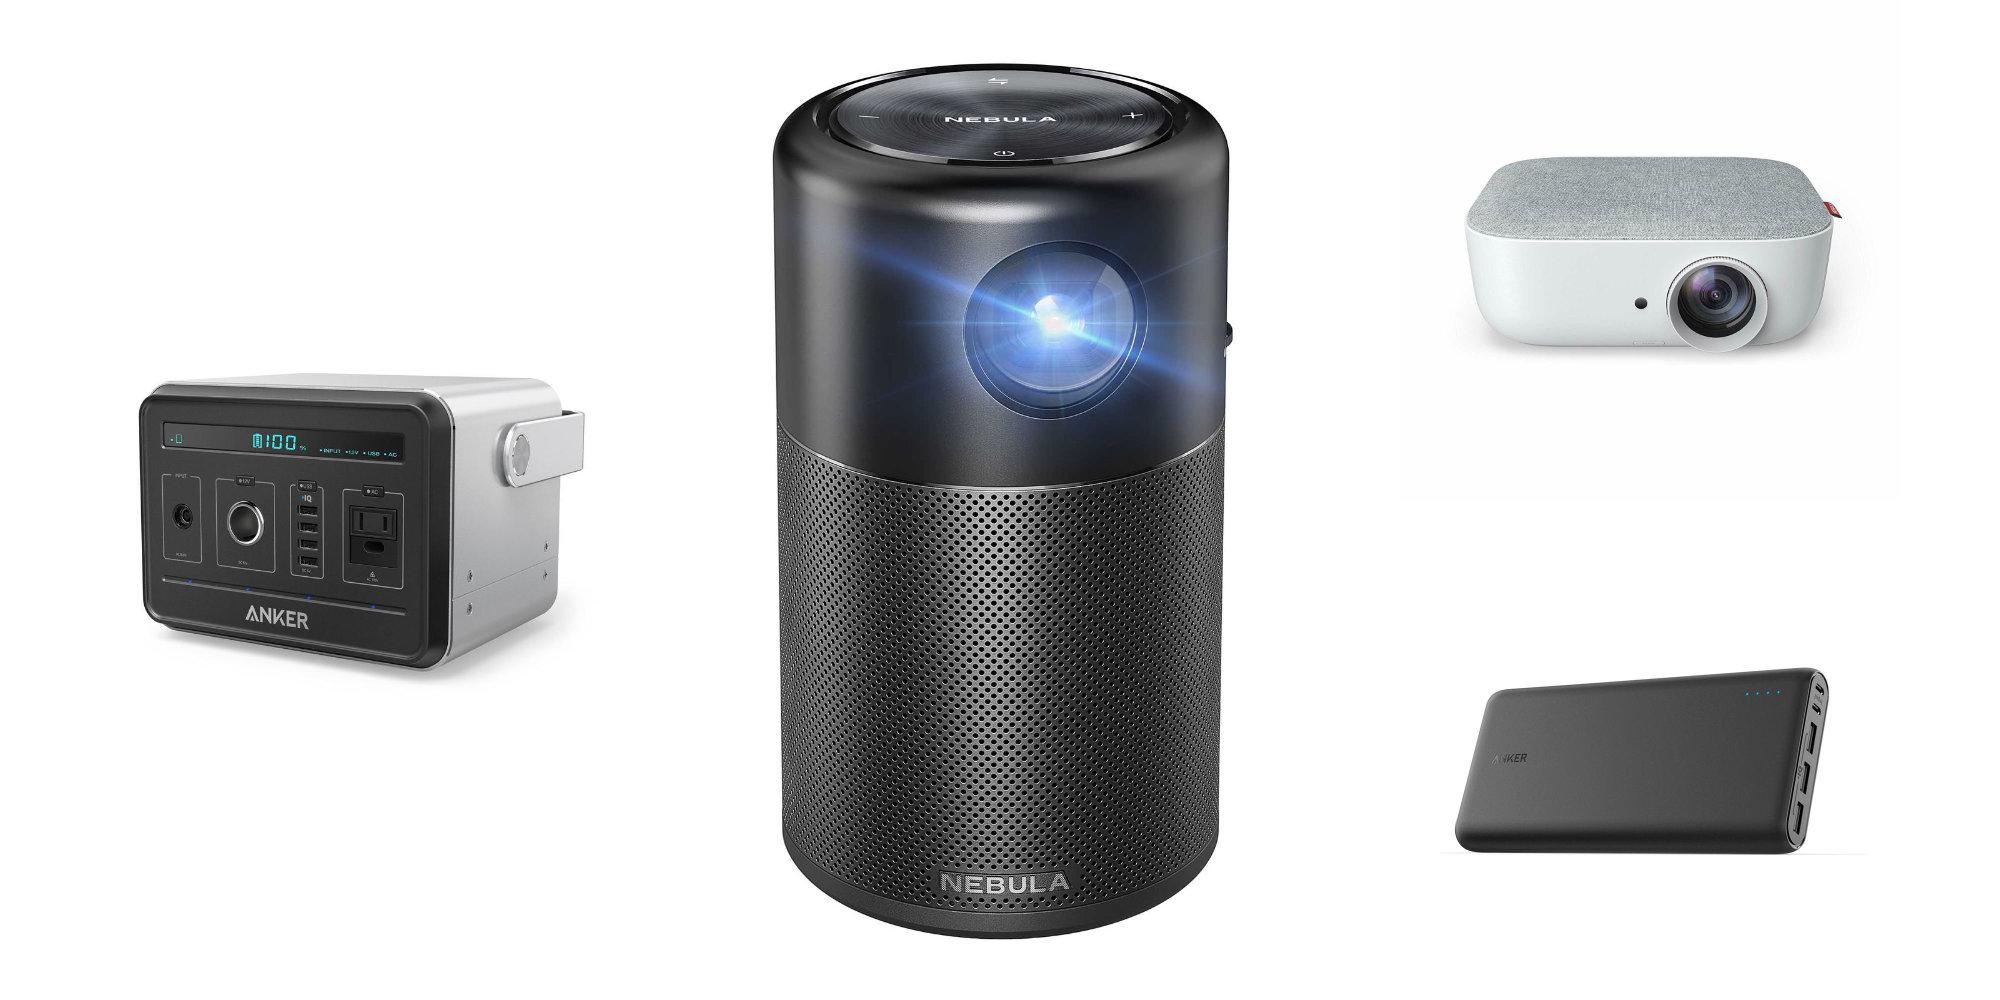 Anker slashes up to 40% off in eBay sale: Nebula Capsule Projector $189 (Refurb, Orig. $350), more